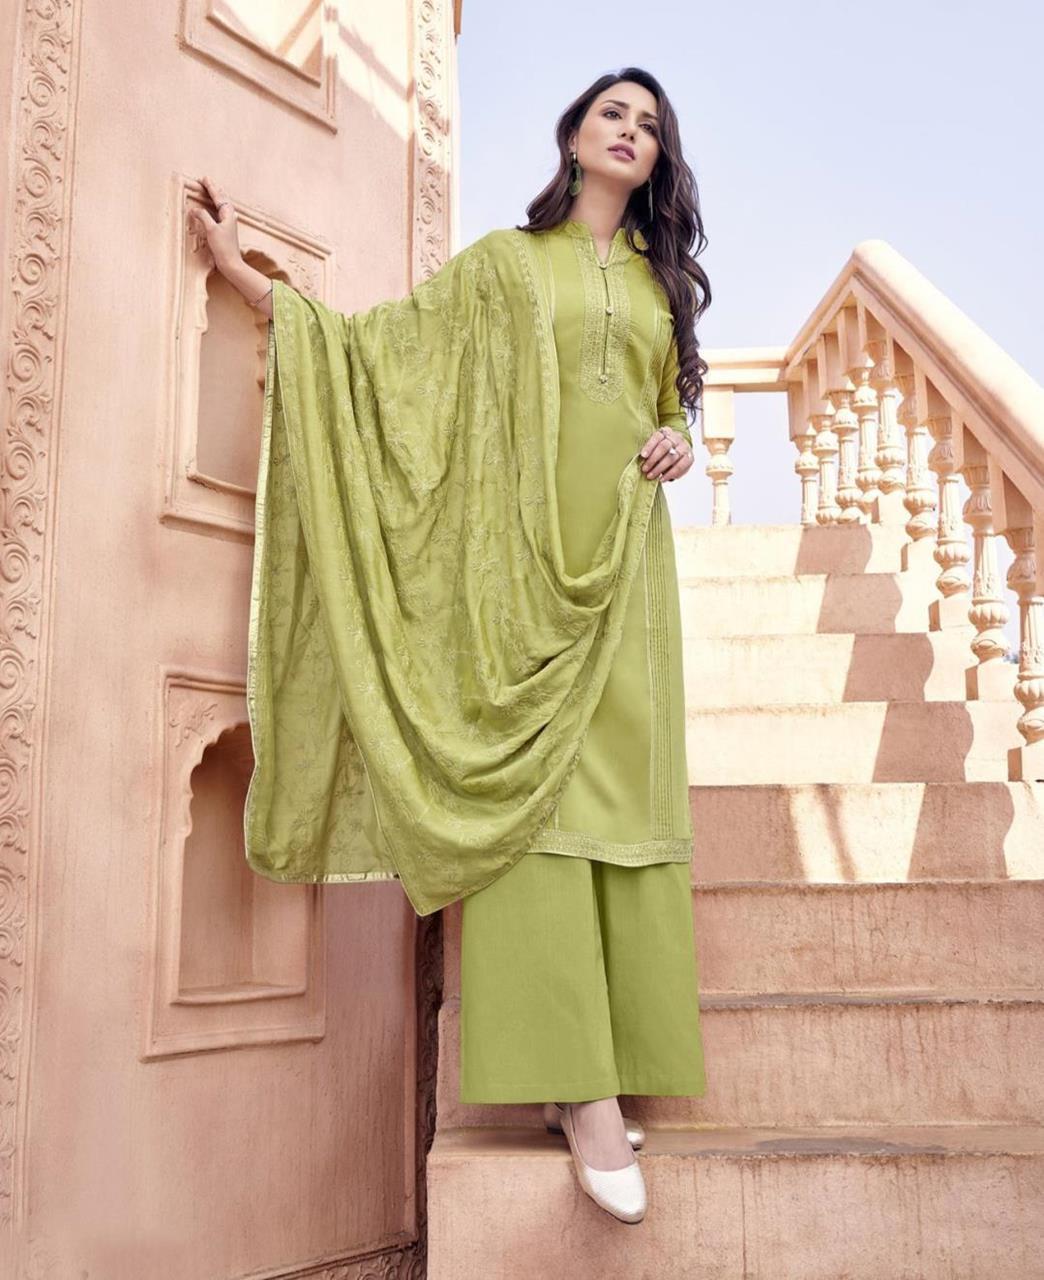 Zari Cotton Straight cut Salwar Kameez in Pista Green